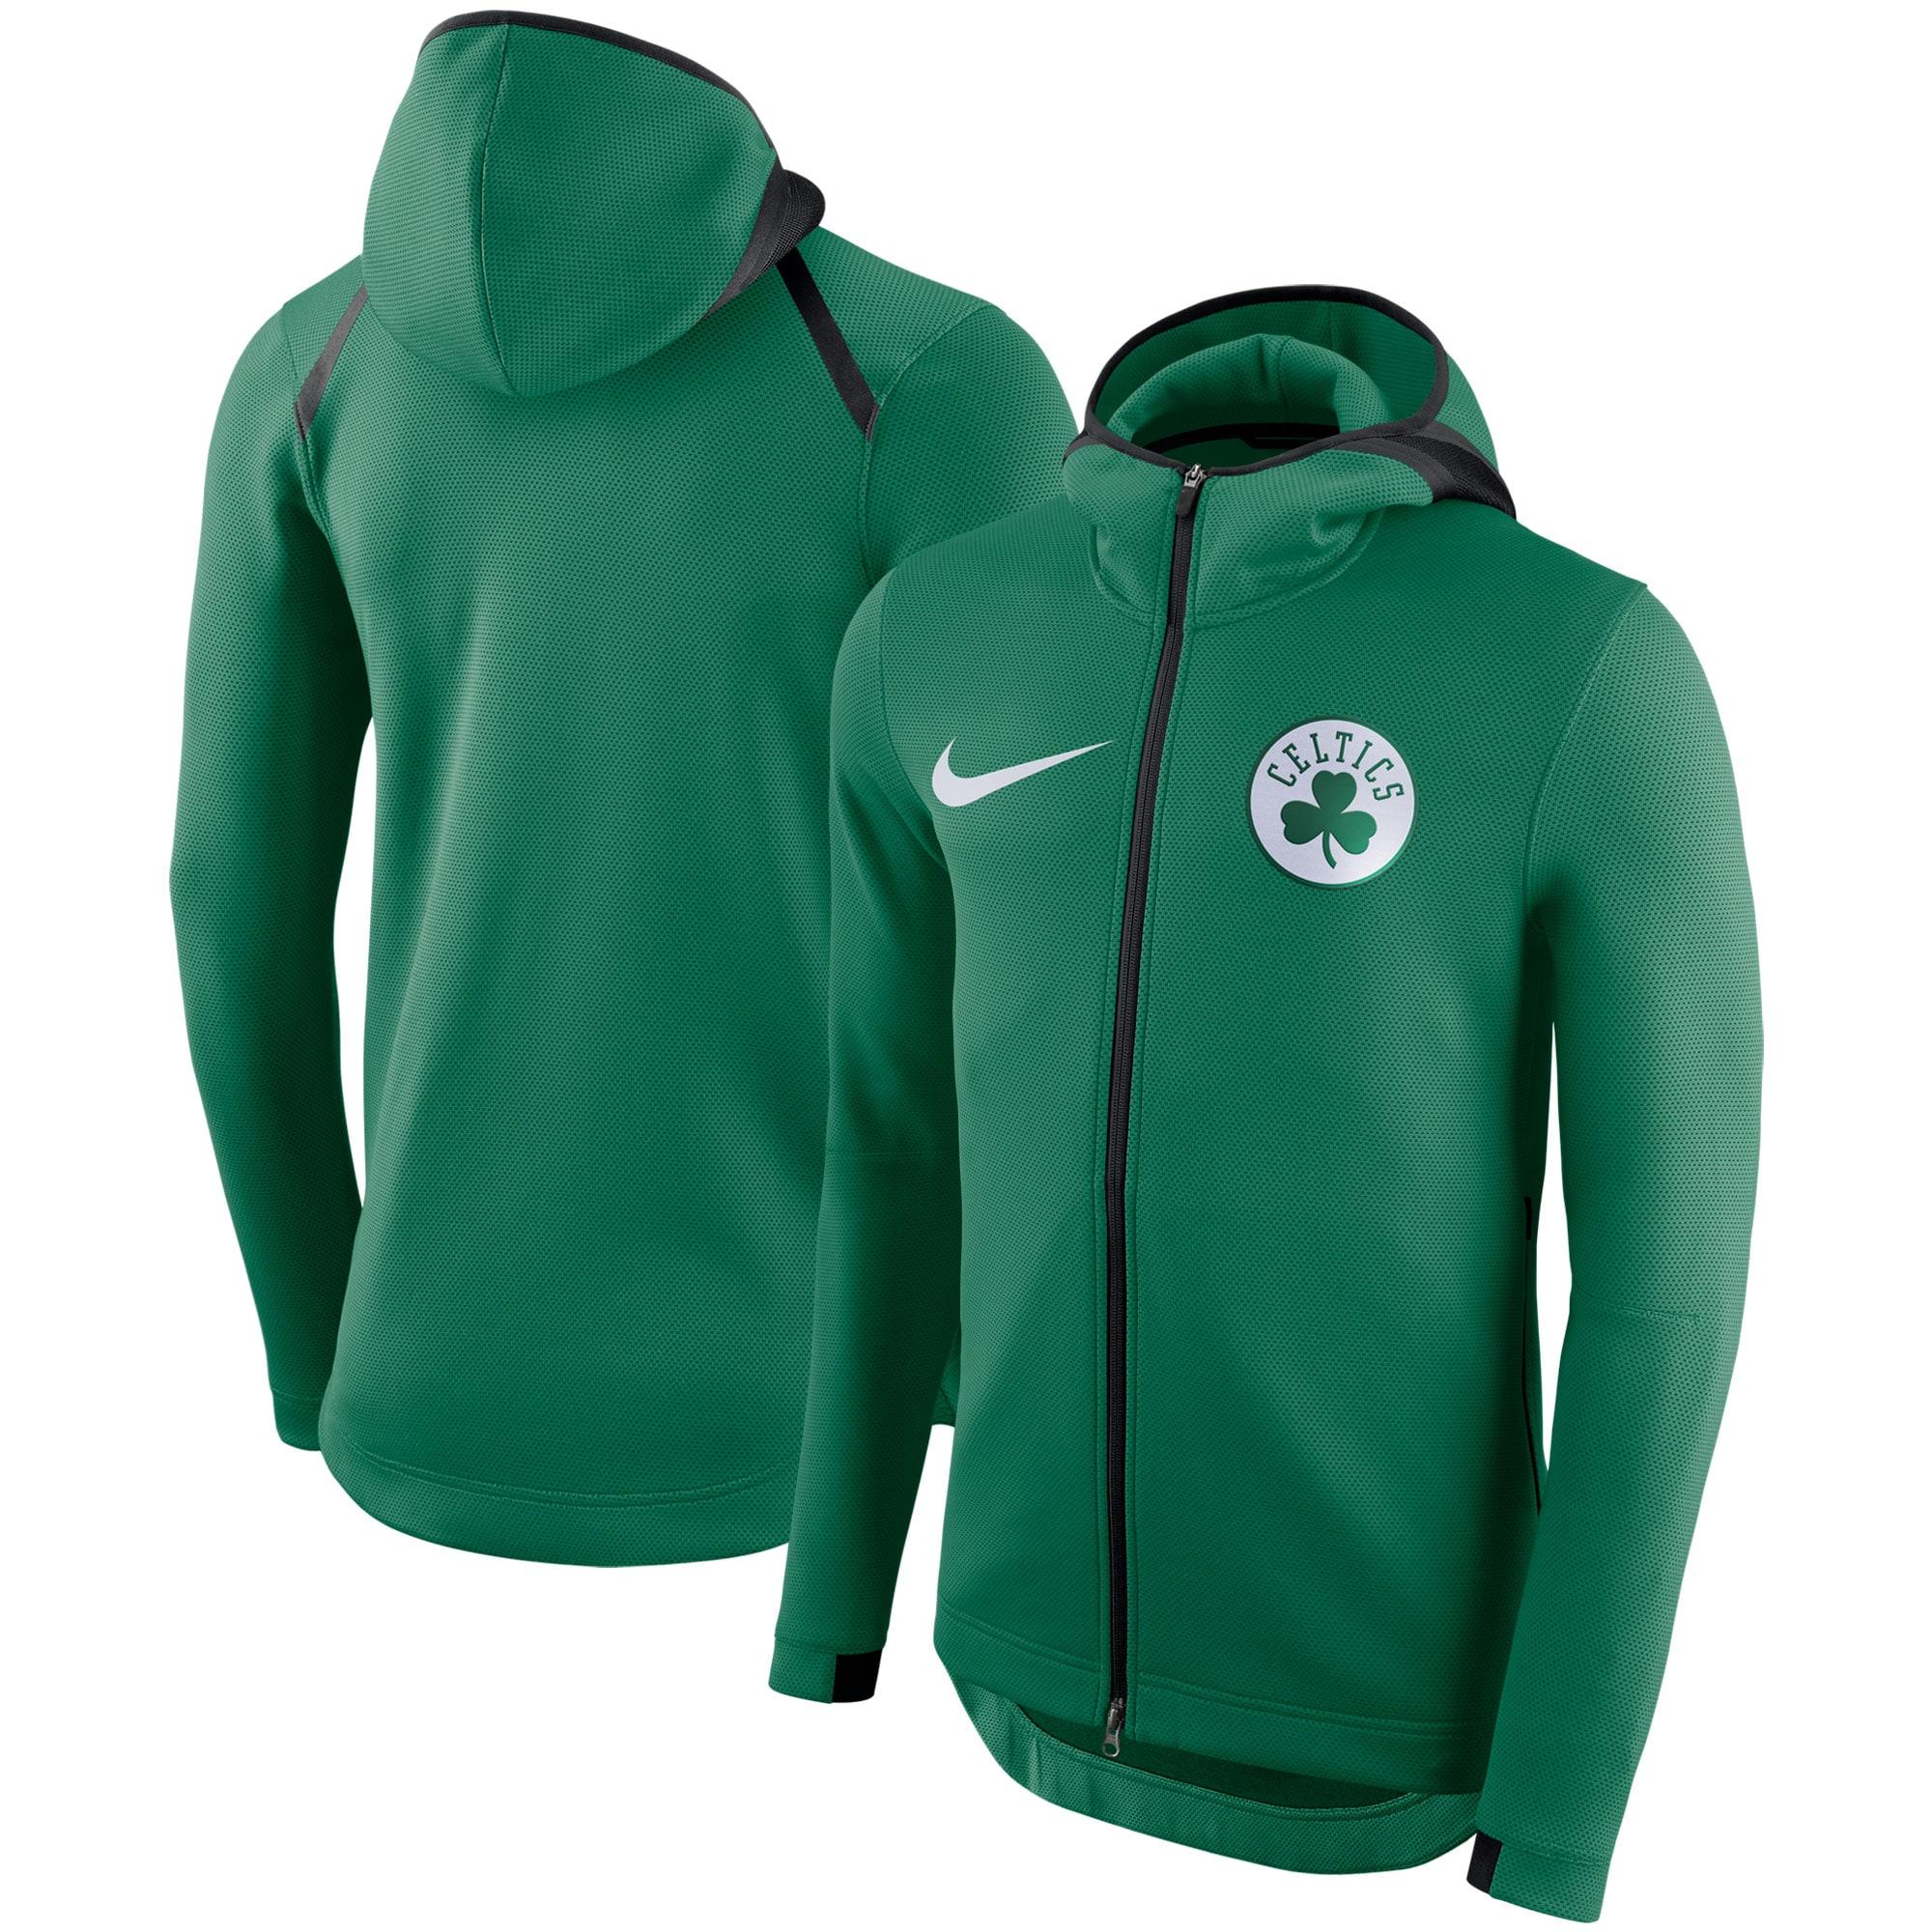 Boston Celtics Nike Showtime Therma Flex Performance Full-Zip Hoodie - Kelly Green